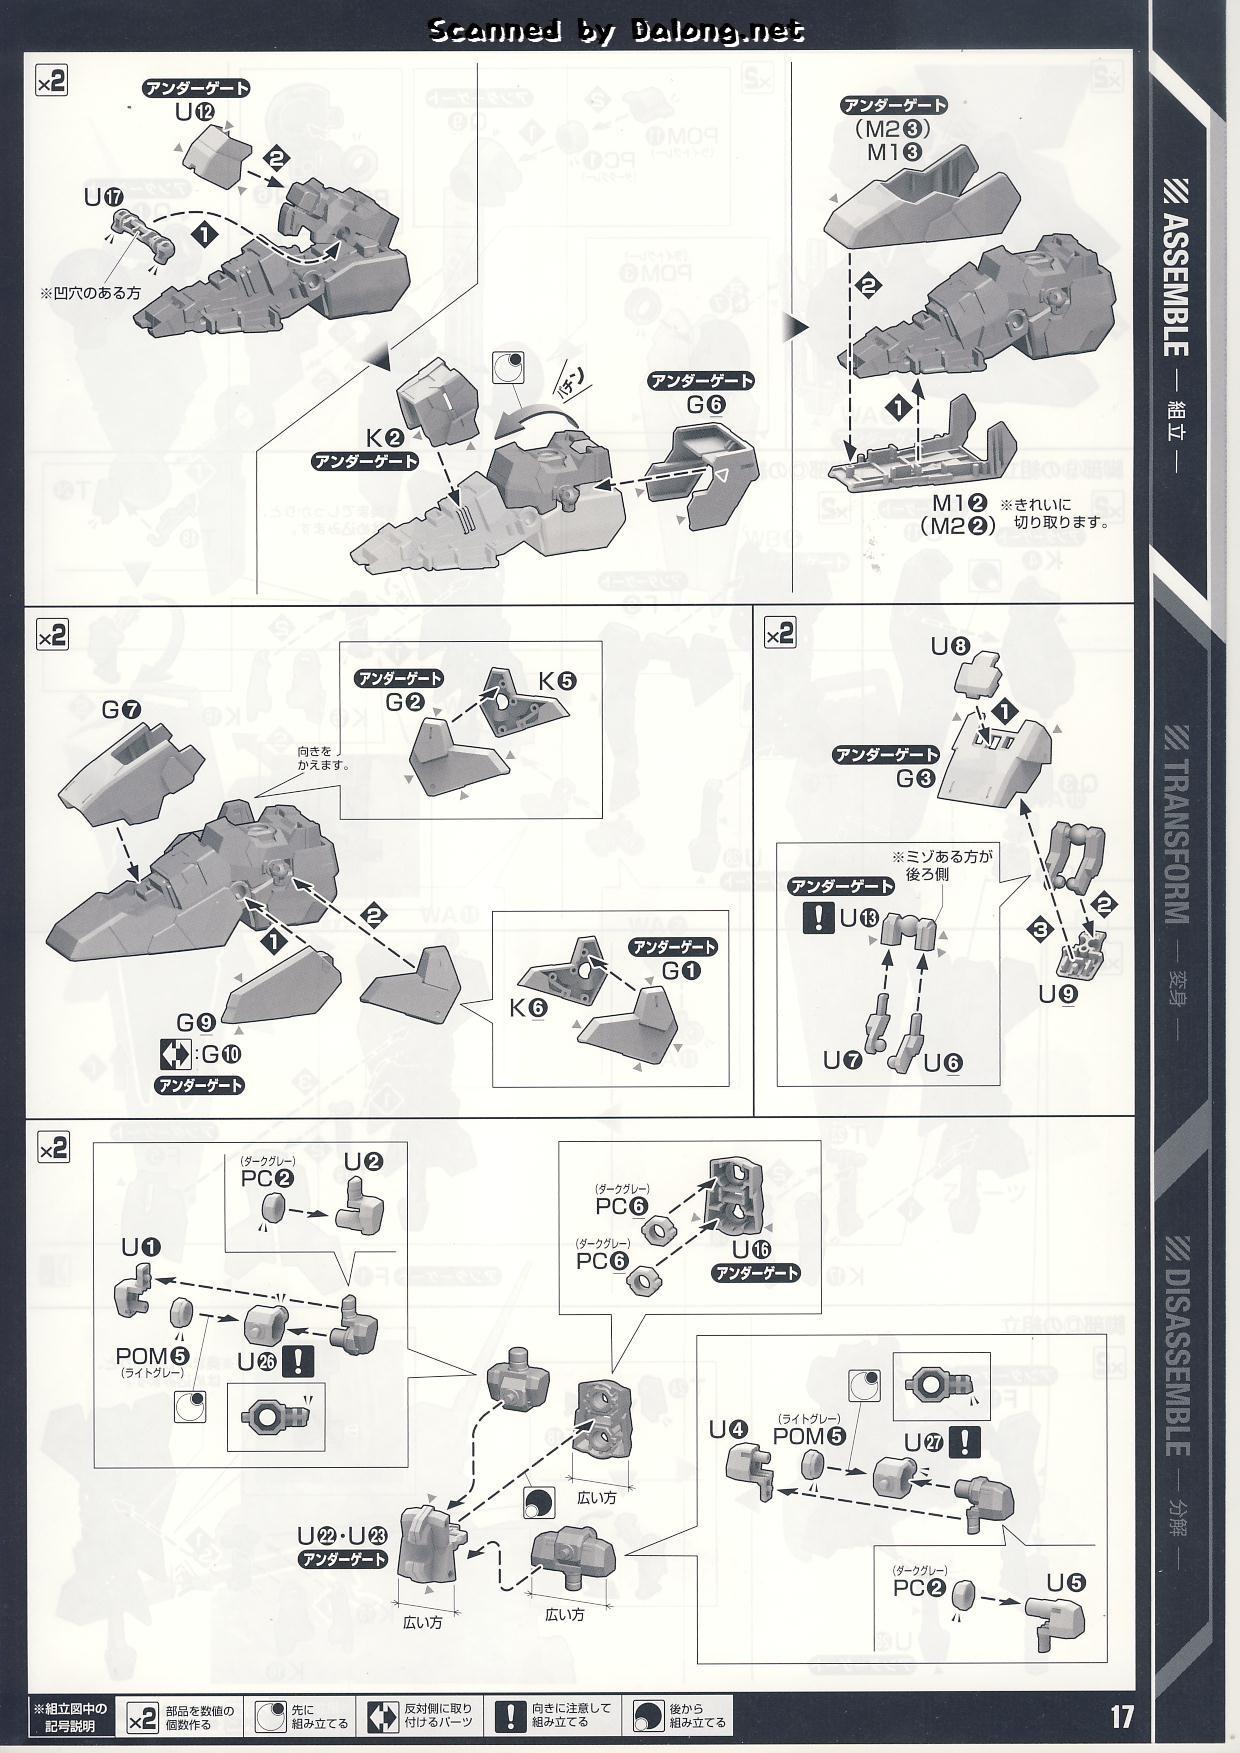 PG15独角兽高达说明17.JPG